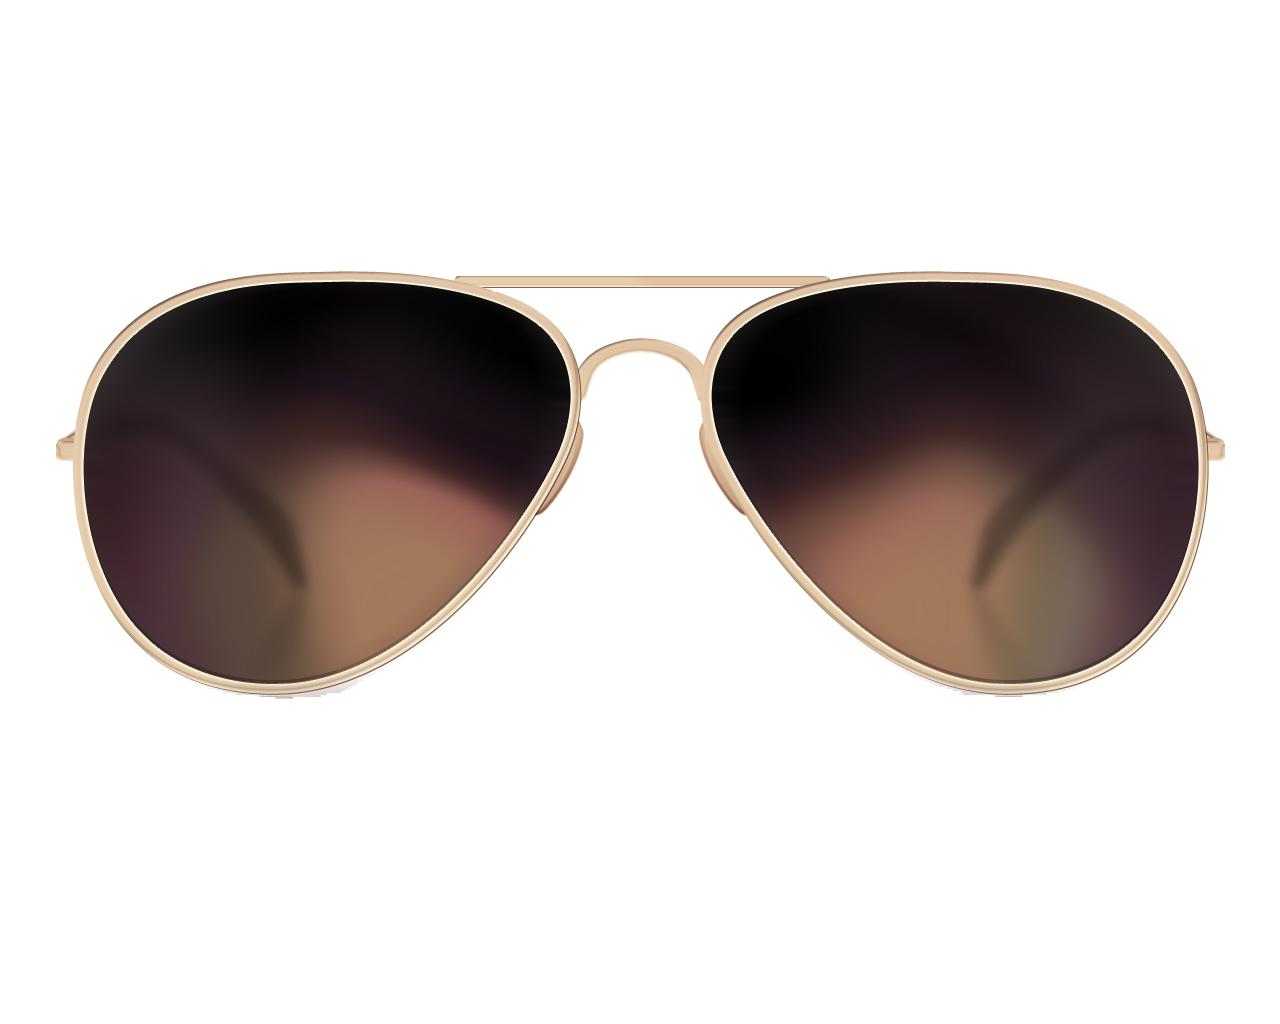 Dark png transparent transparentpng. Sunglasses clipart glass tumblr